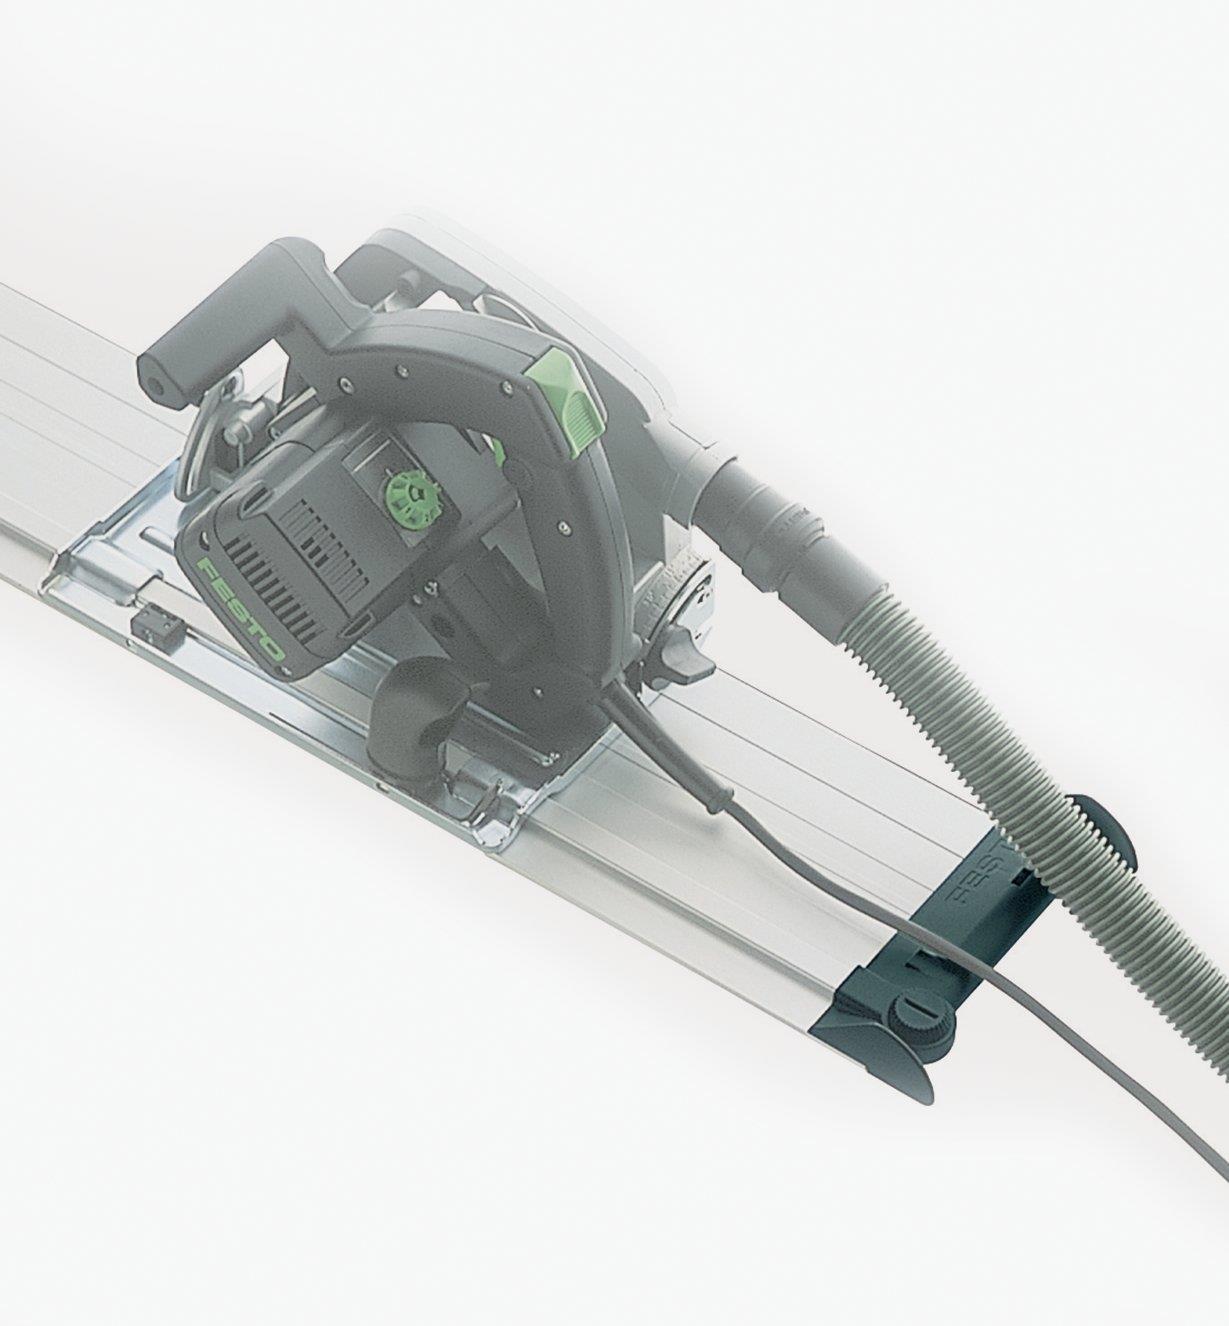 ZA489022 - Deflector